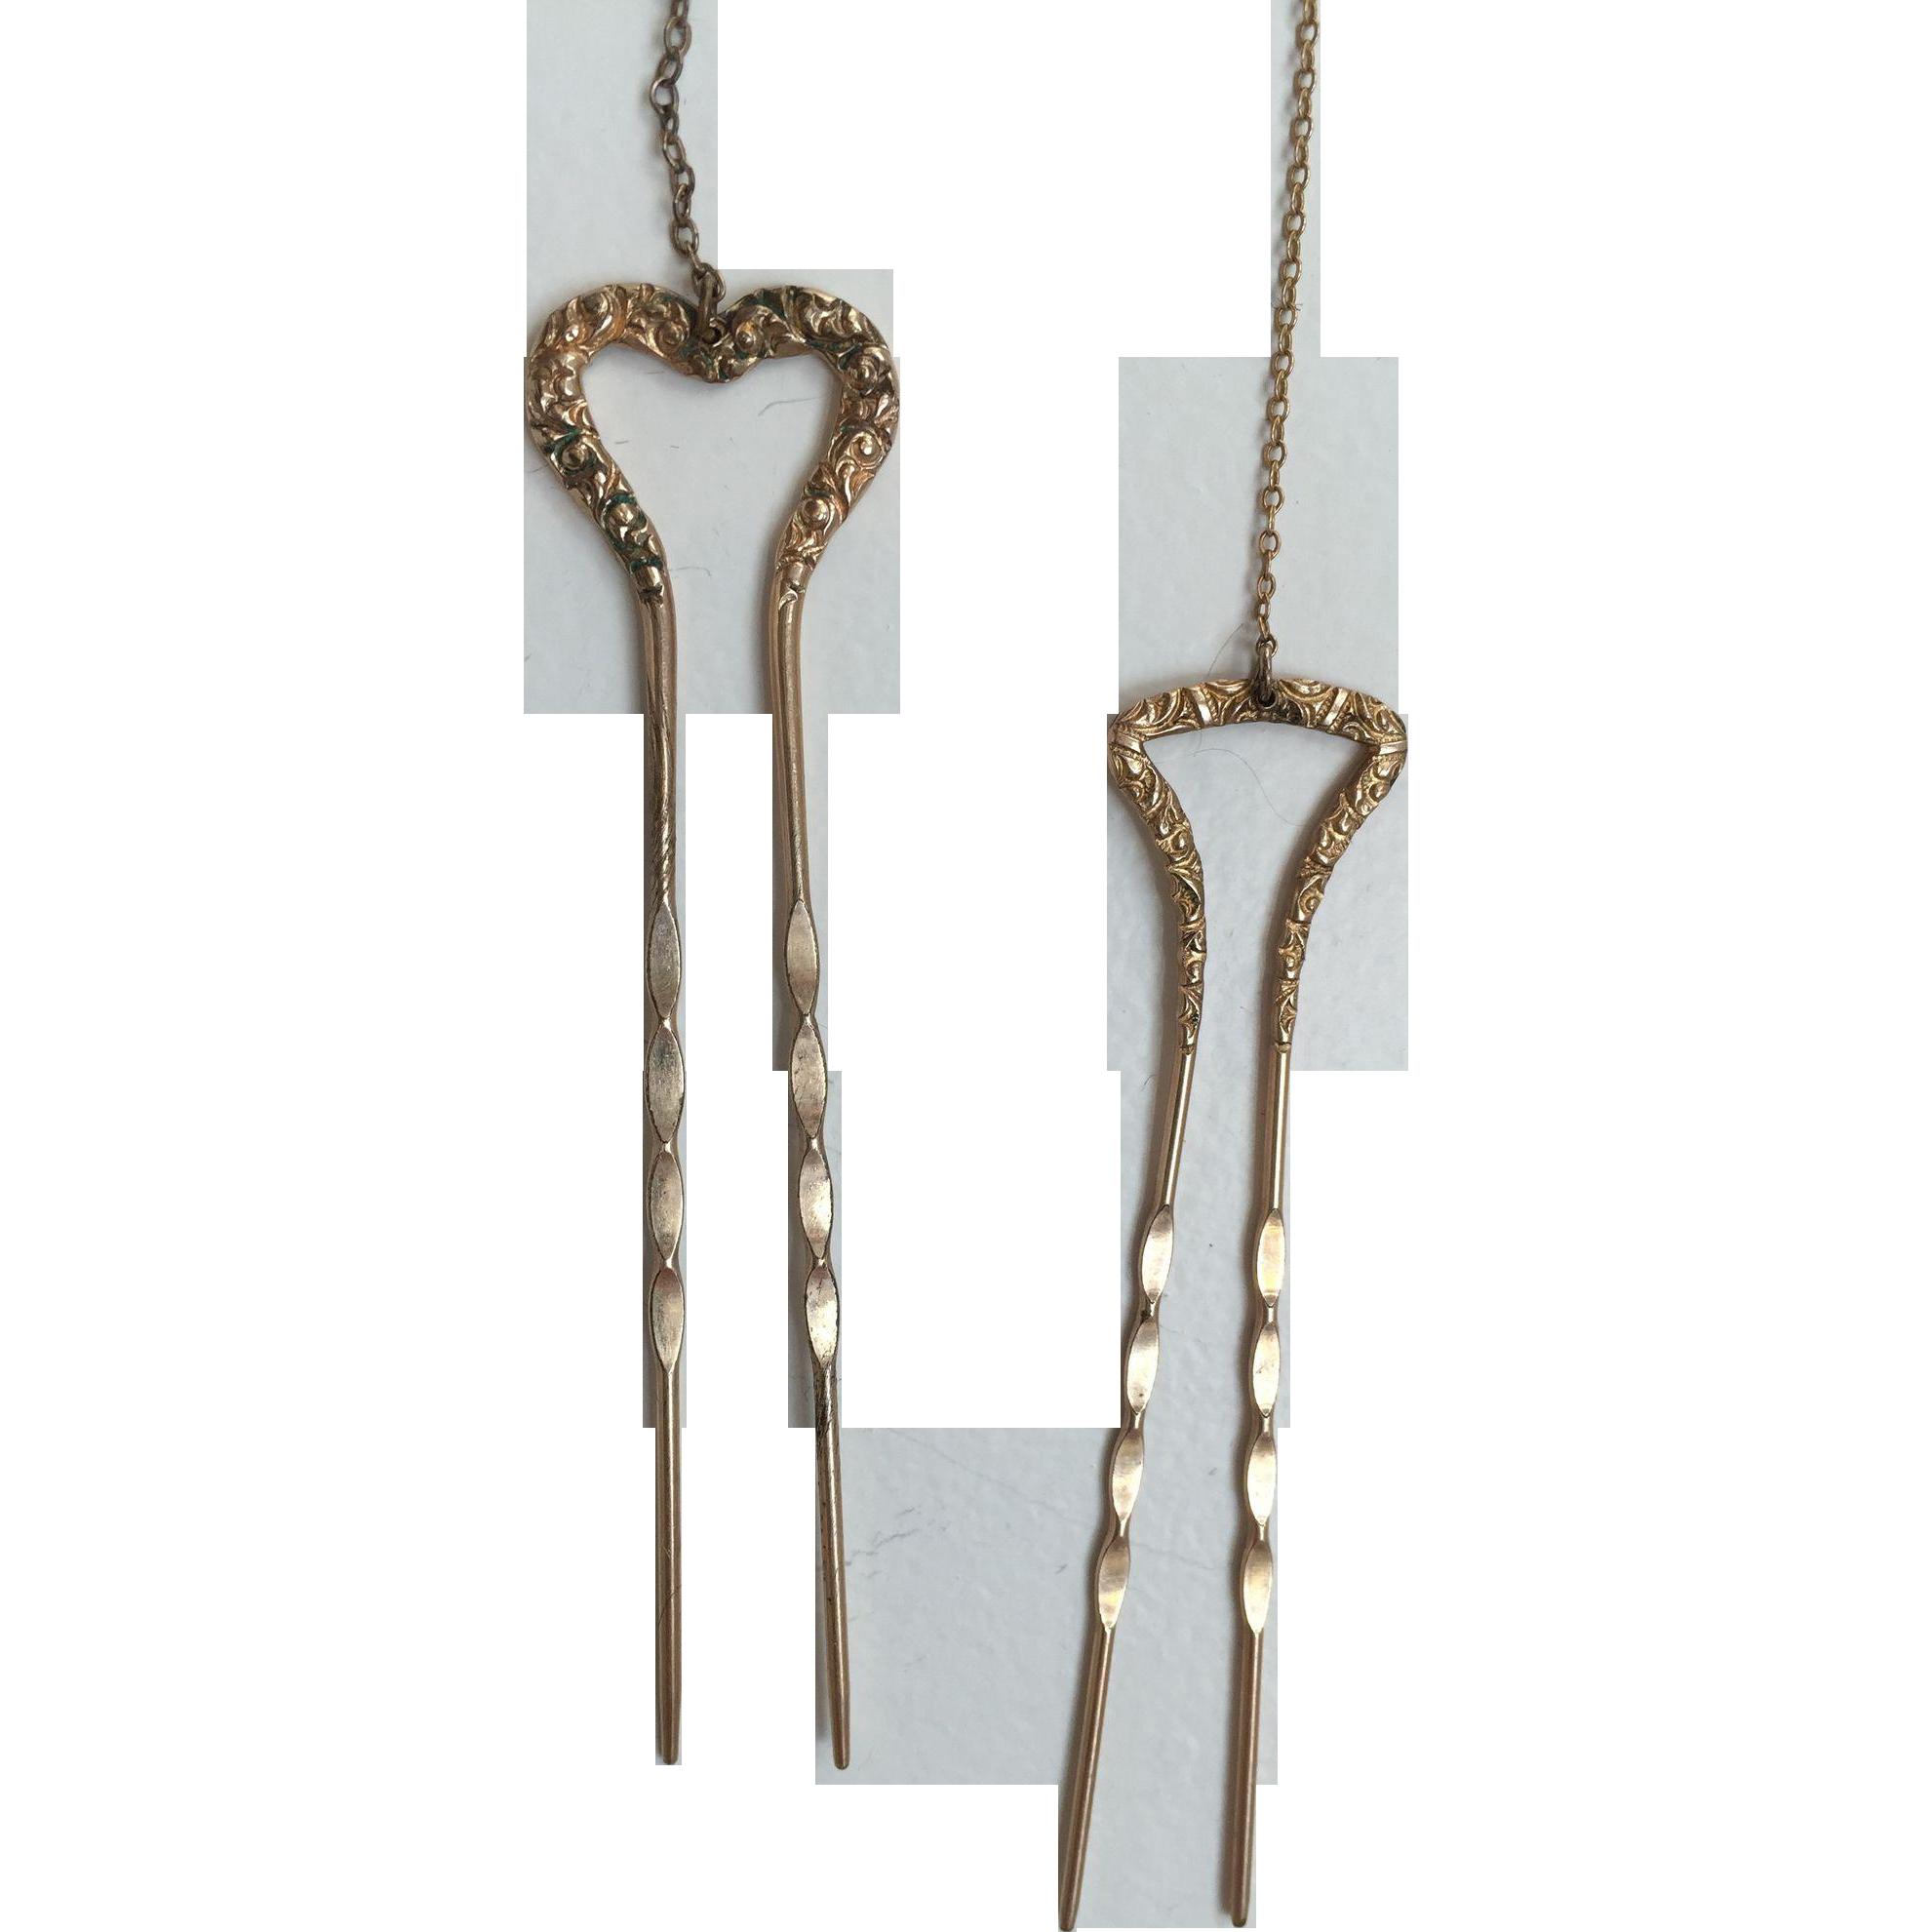 Marian Anderson's Hair Pins